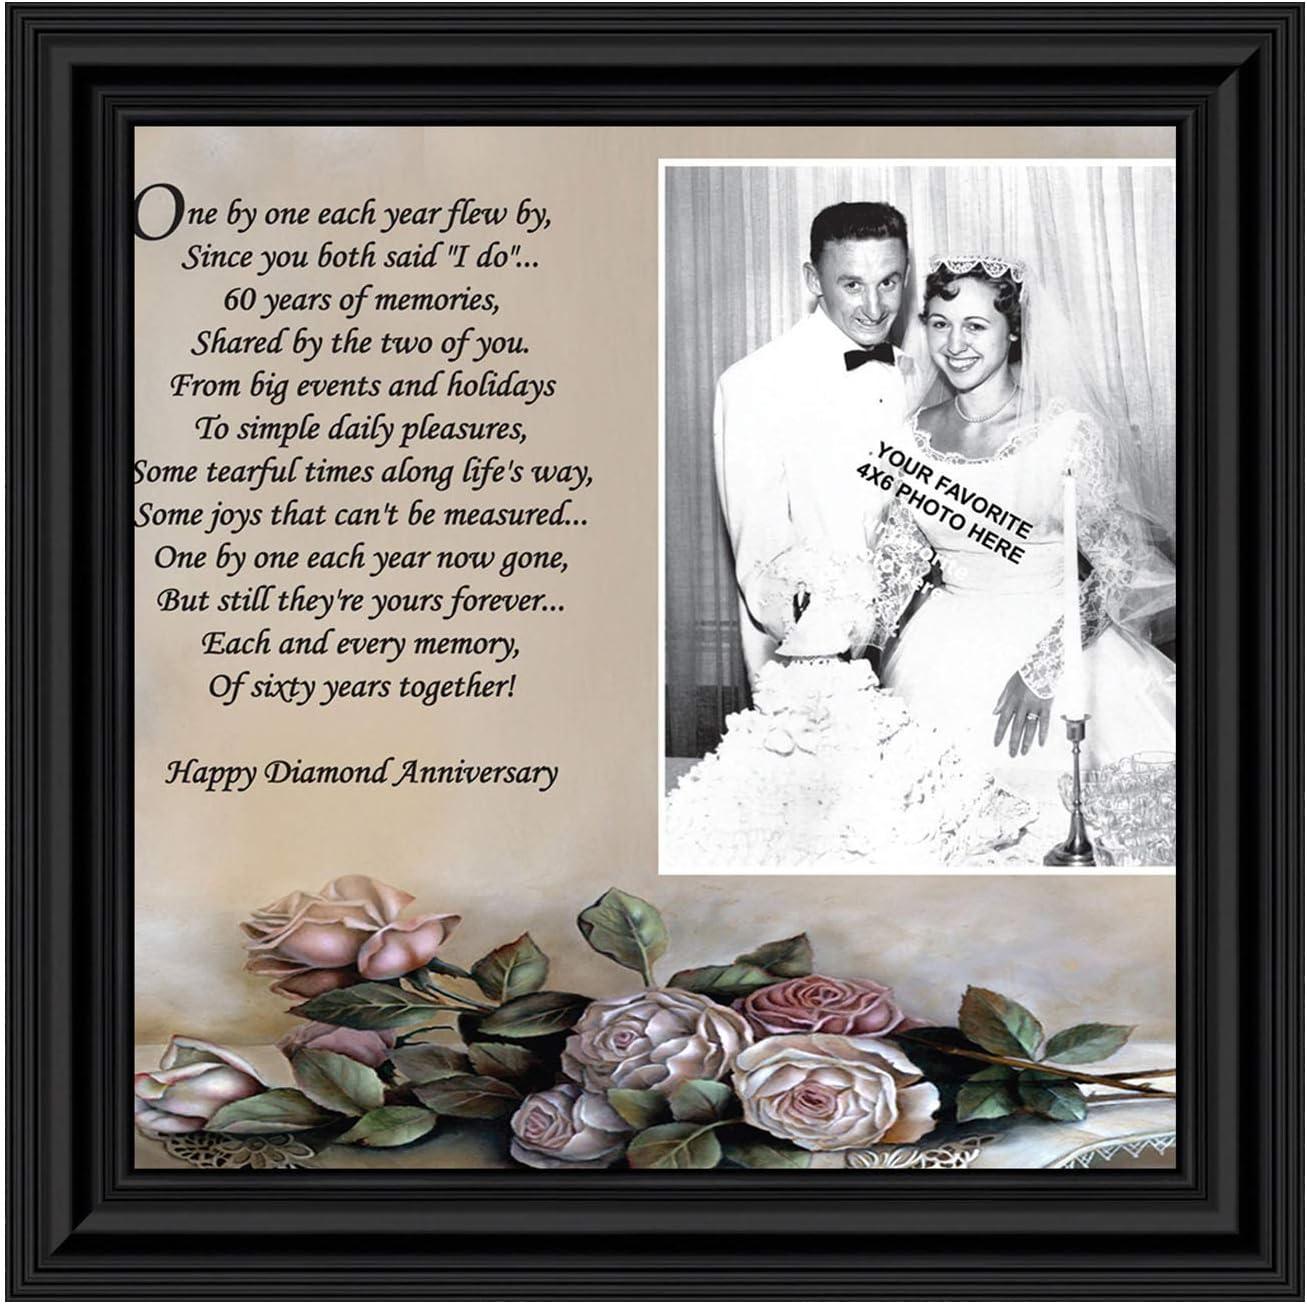 Amazon Com Crossroads Home Decor 60th Diamond 60th Wedding Anniversary Grandparents Gifts For Grandparents 60th Anniversary Card For Parents Picture Frame For Couples 6782b